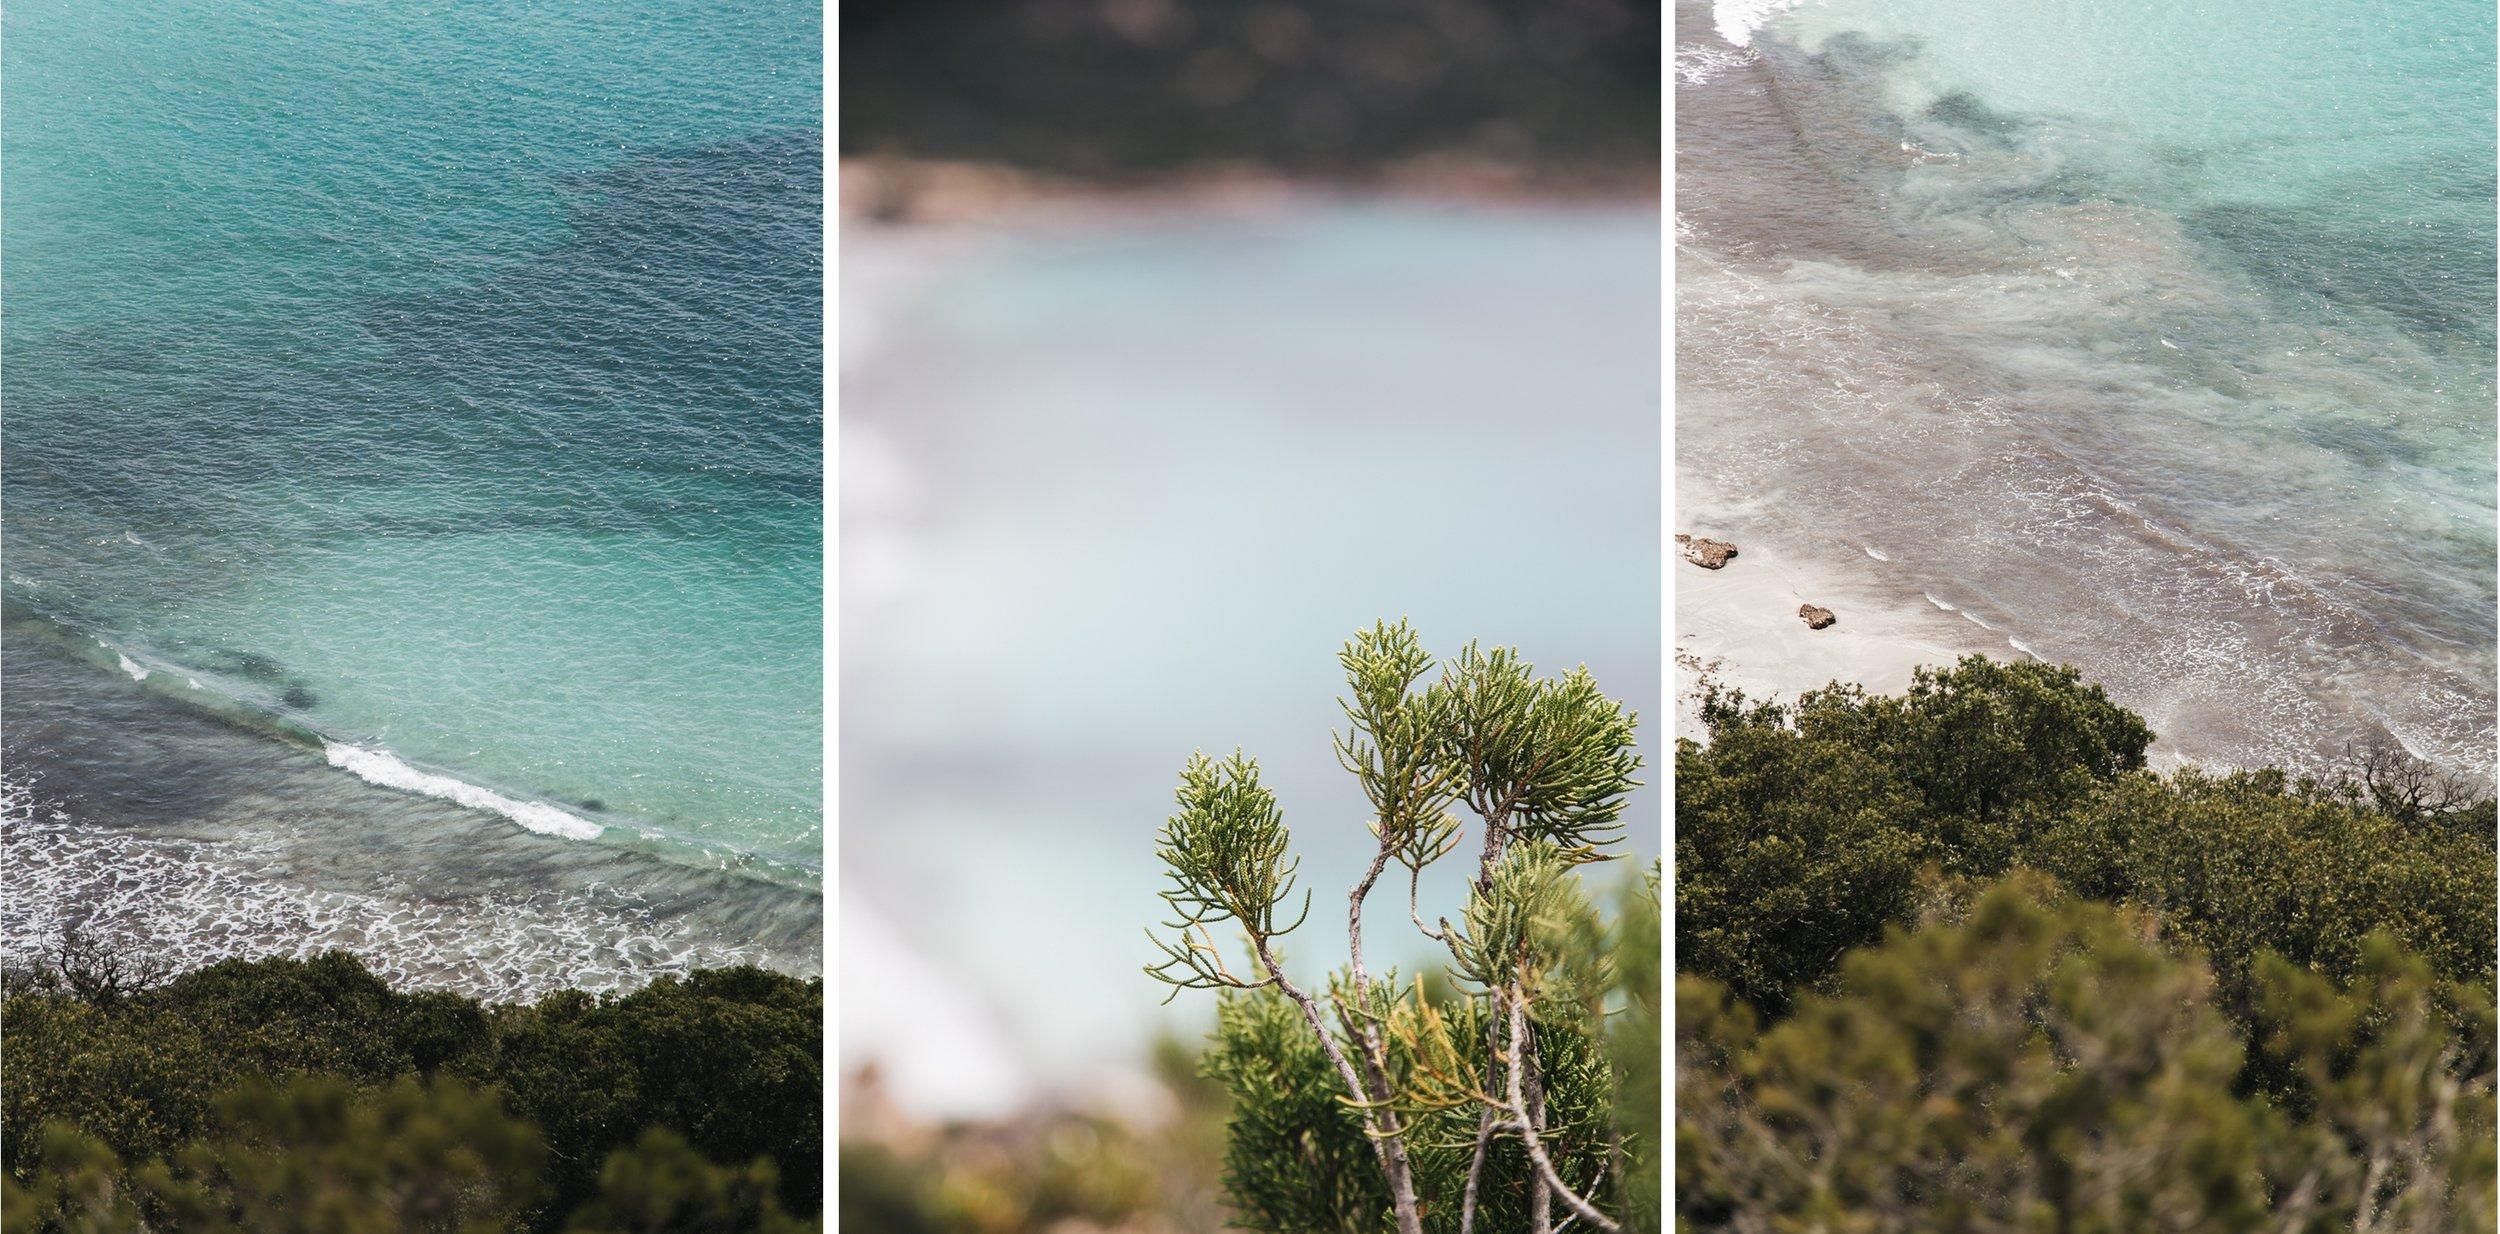 Roccapina-plage-paradisiaque-corse-du-sud.jpg